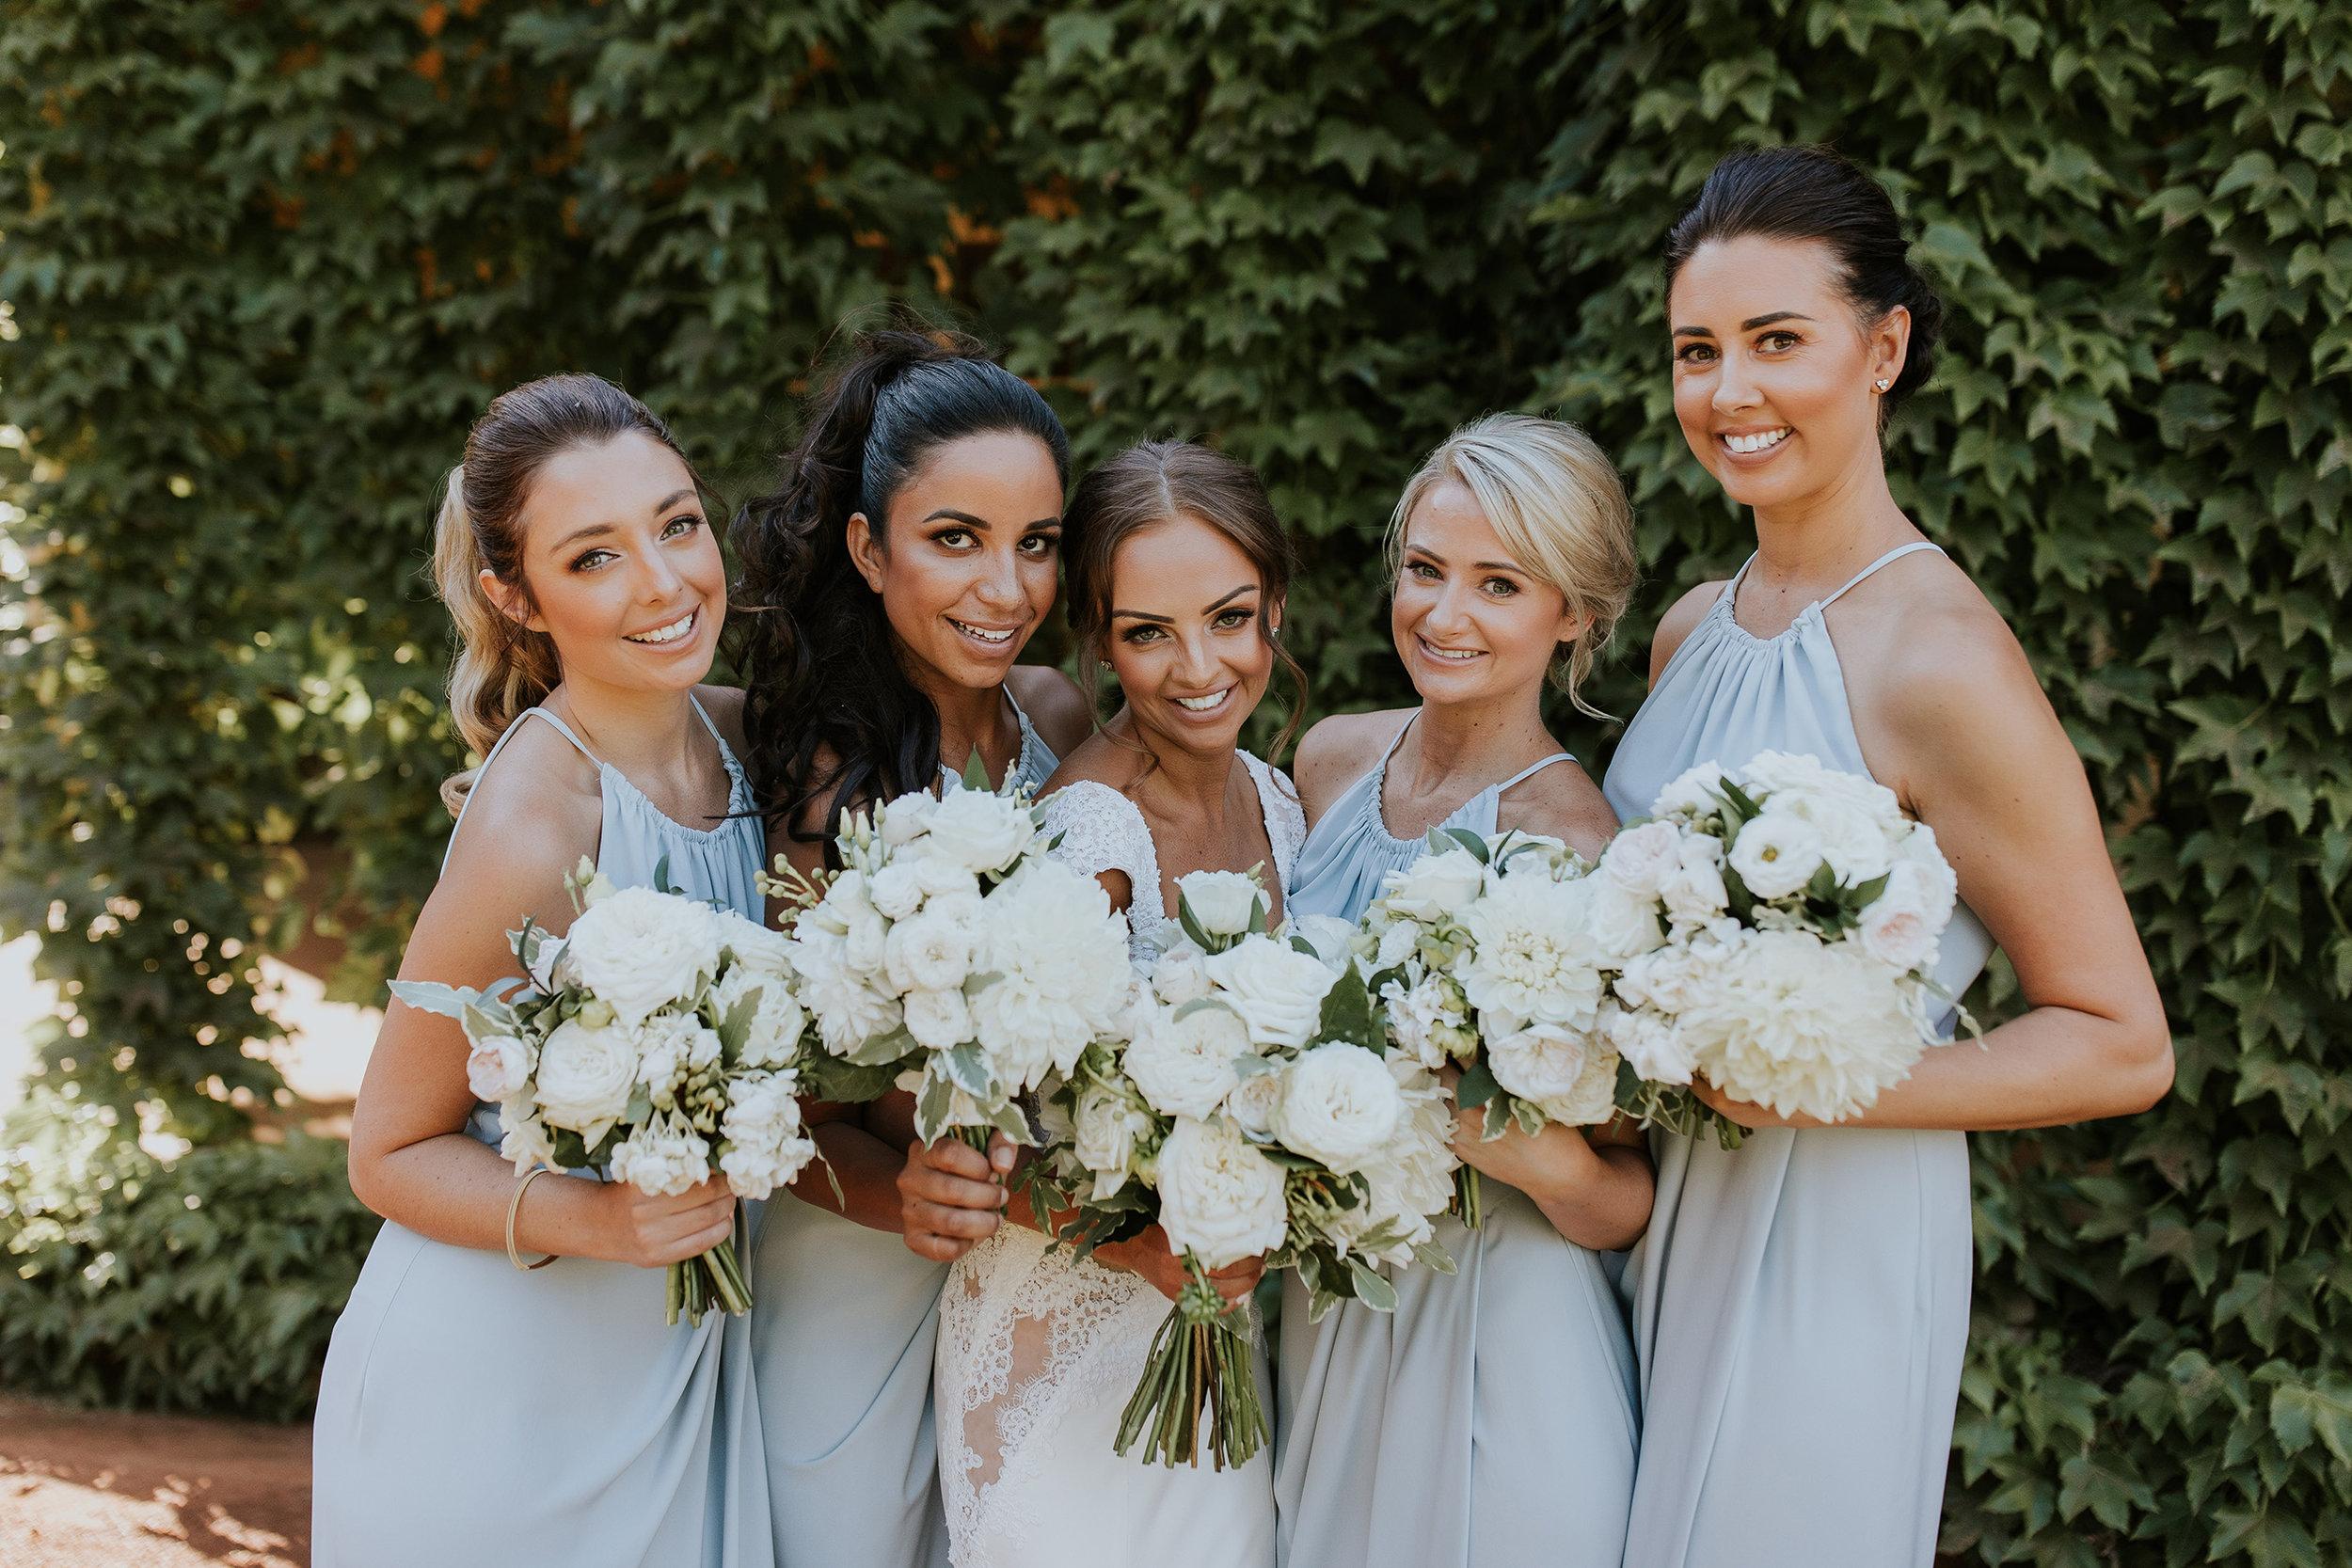 keli-luke-maybury-wedding-296_1.jpg